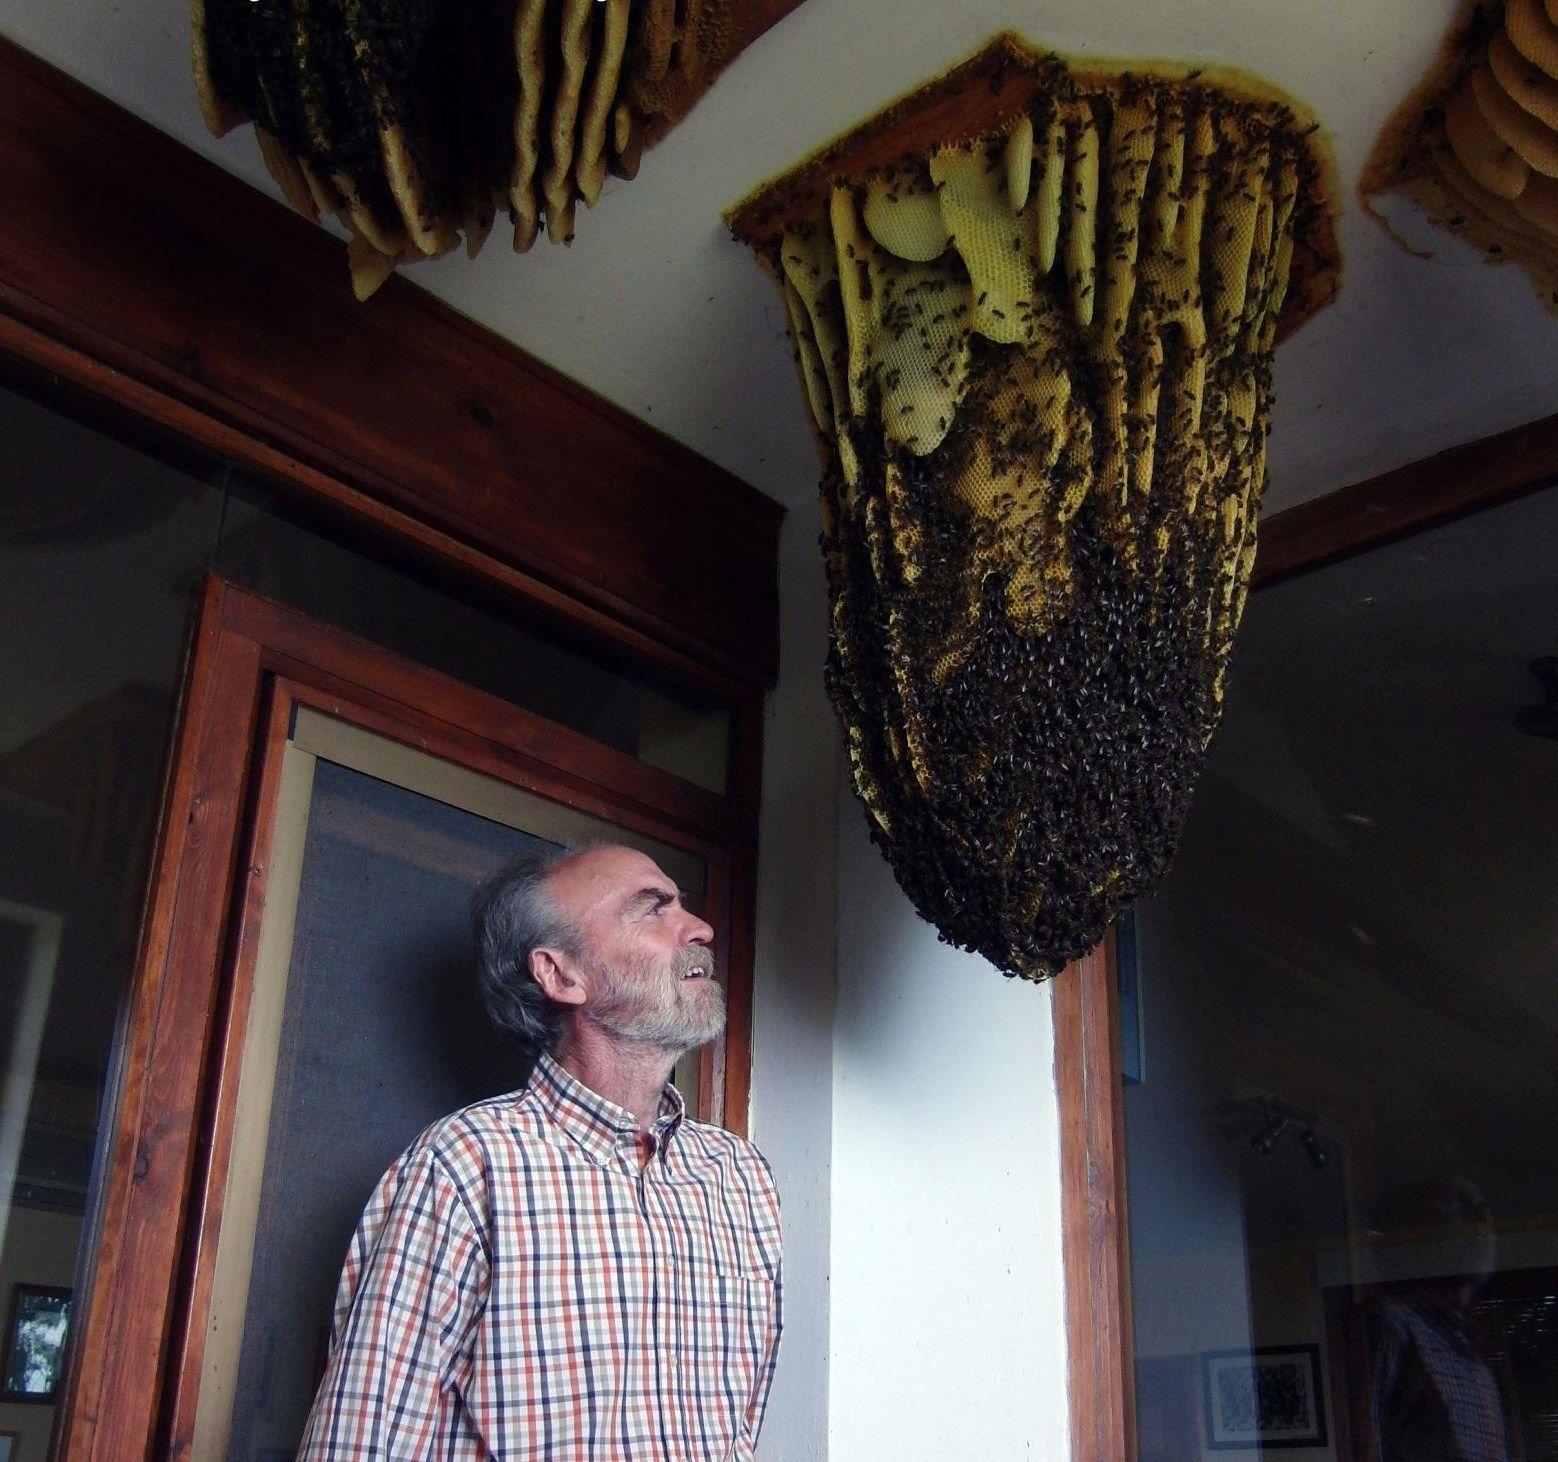 Honeybee home invasion